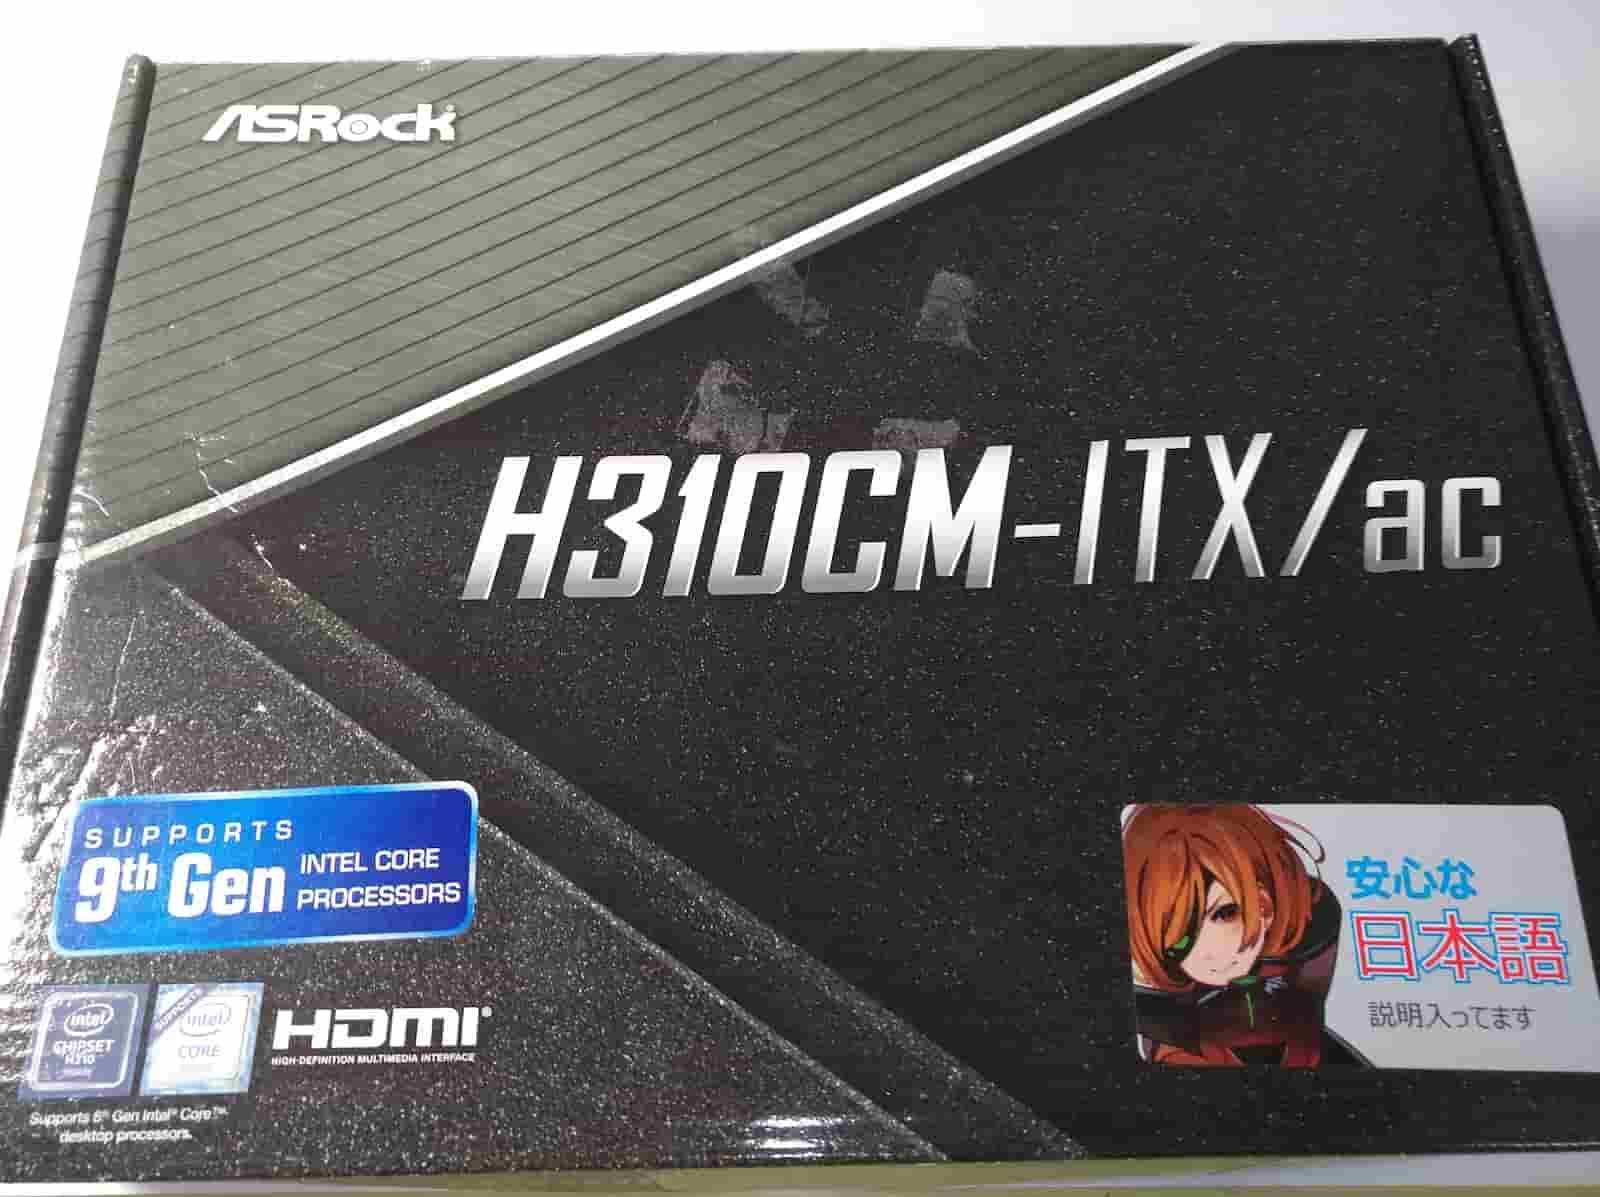 h310cm-itx/ac